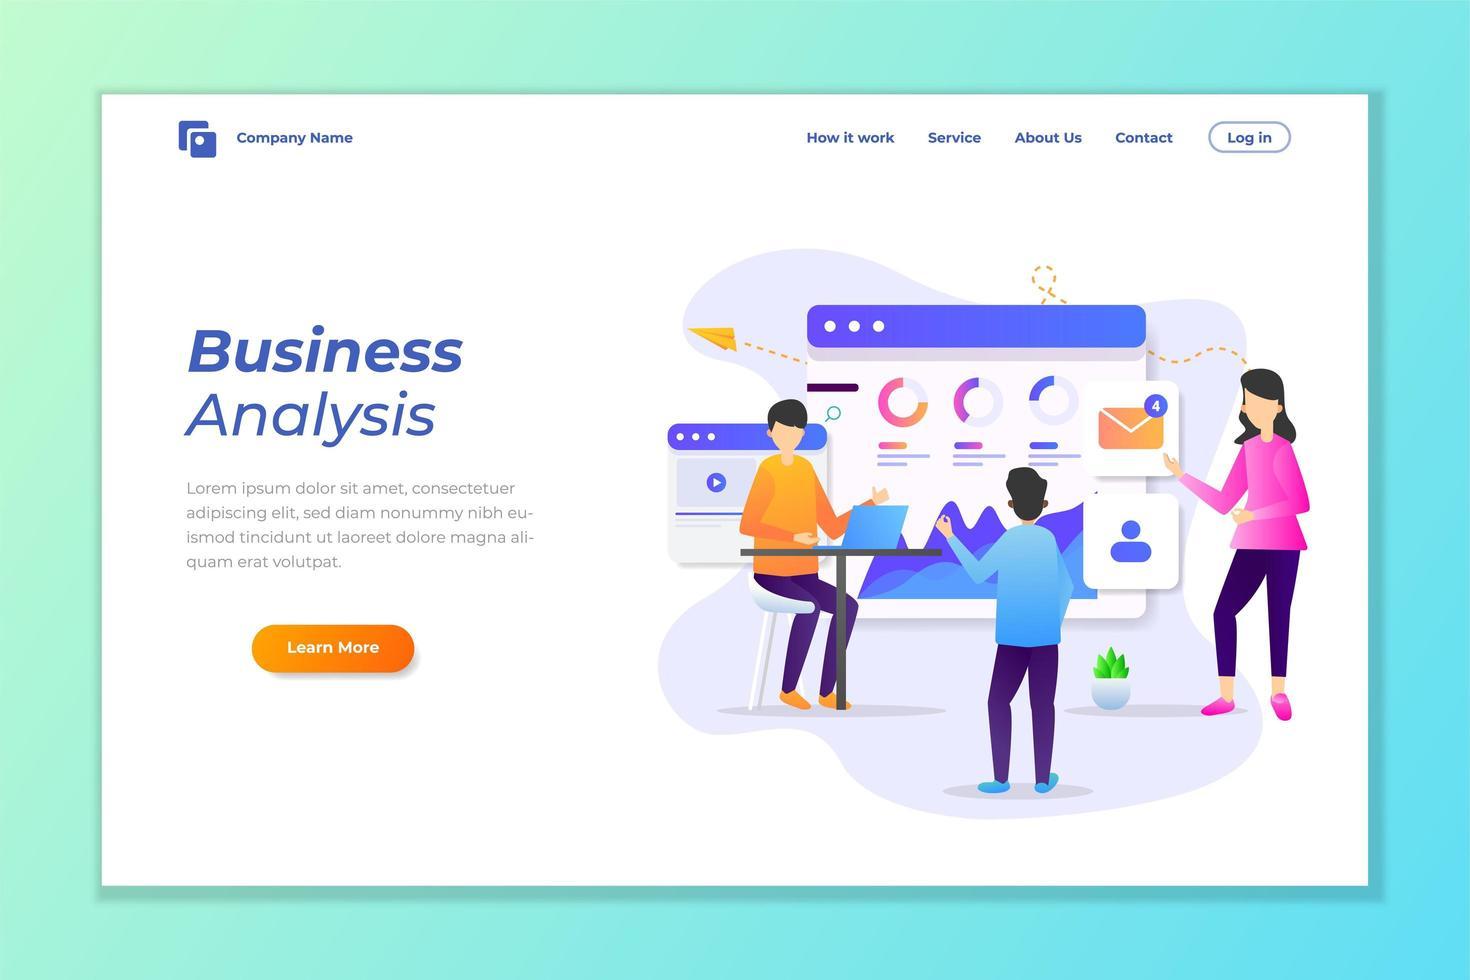 Geschäftsdatenanalyse, digitale Marketing-Landingpage vektor